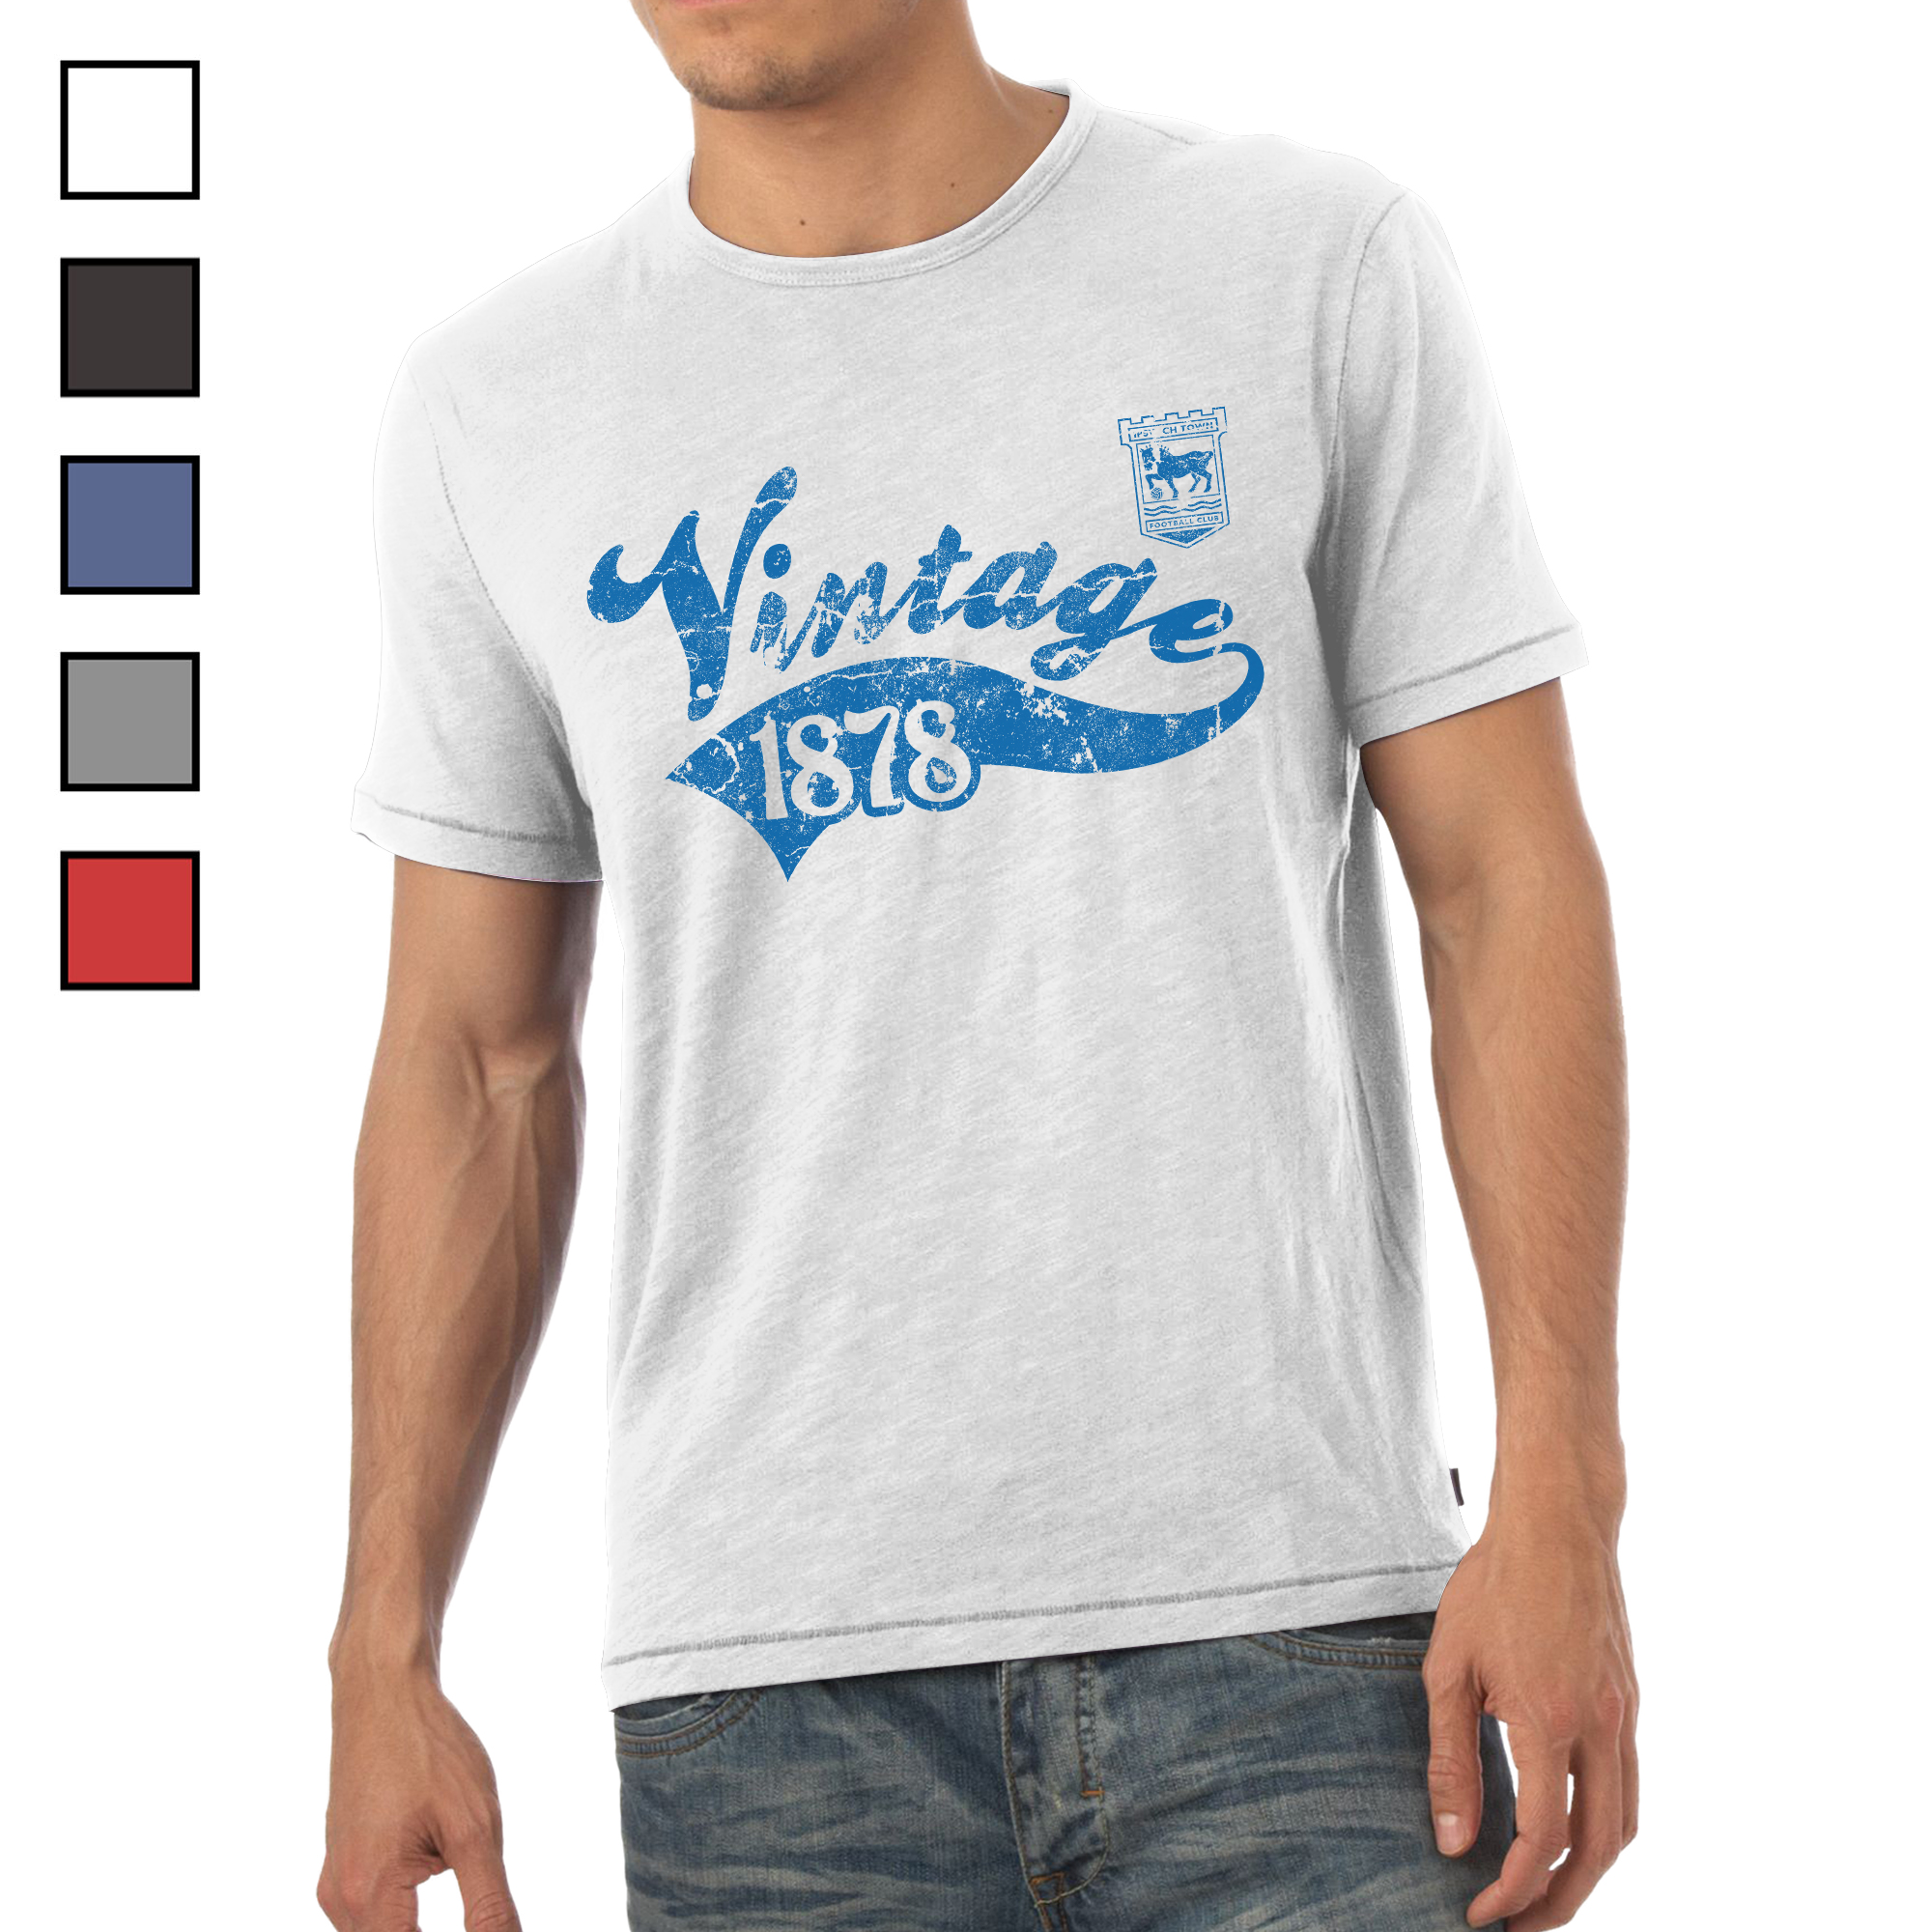 Ipswich Town FC Mens Vintage T-Shirt